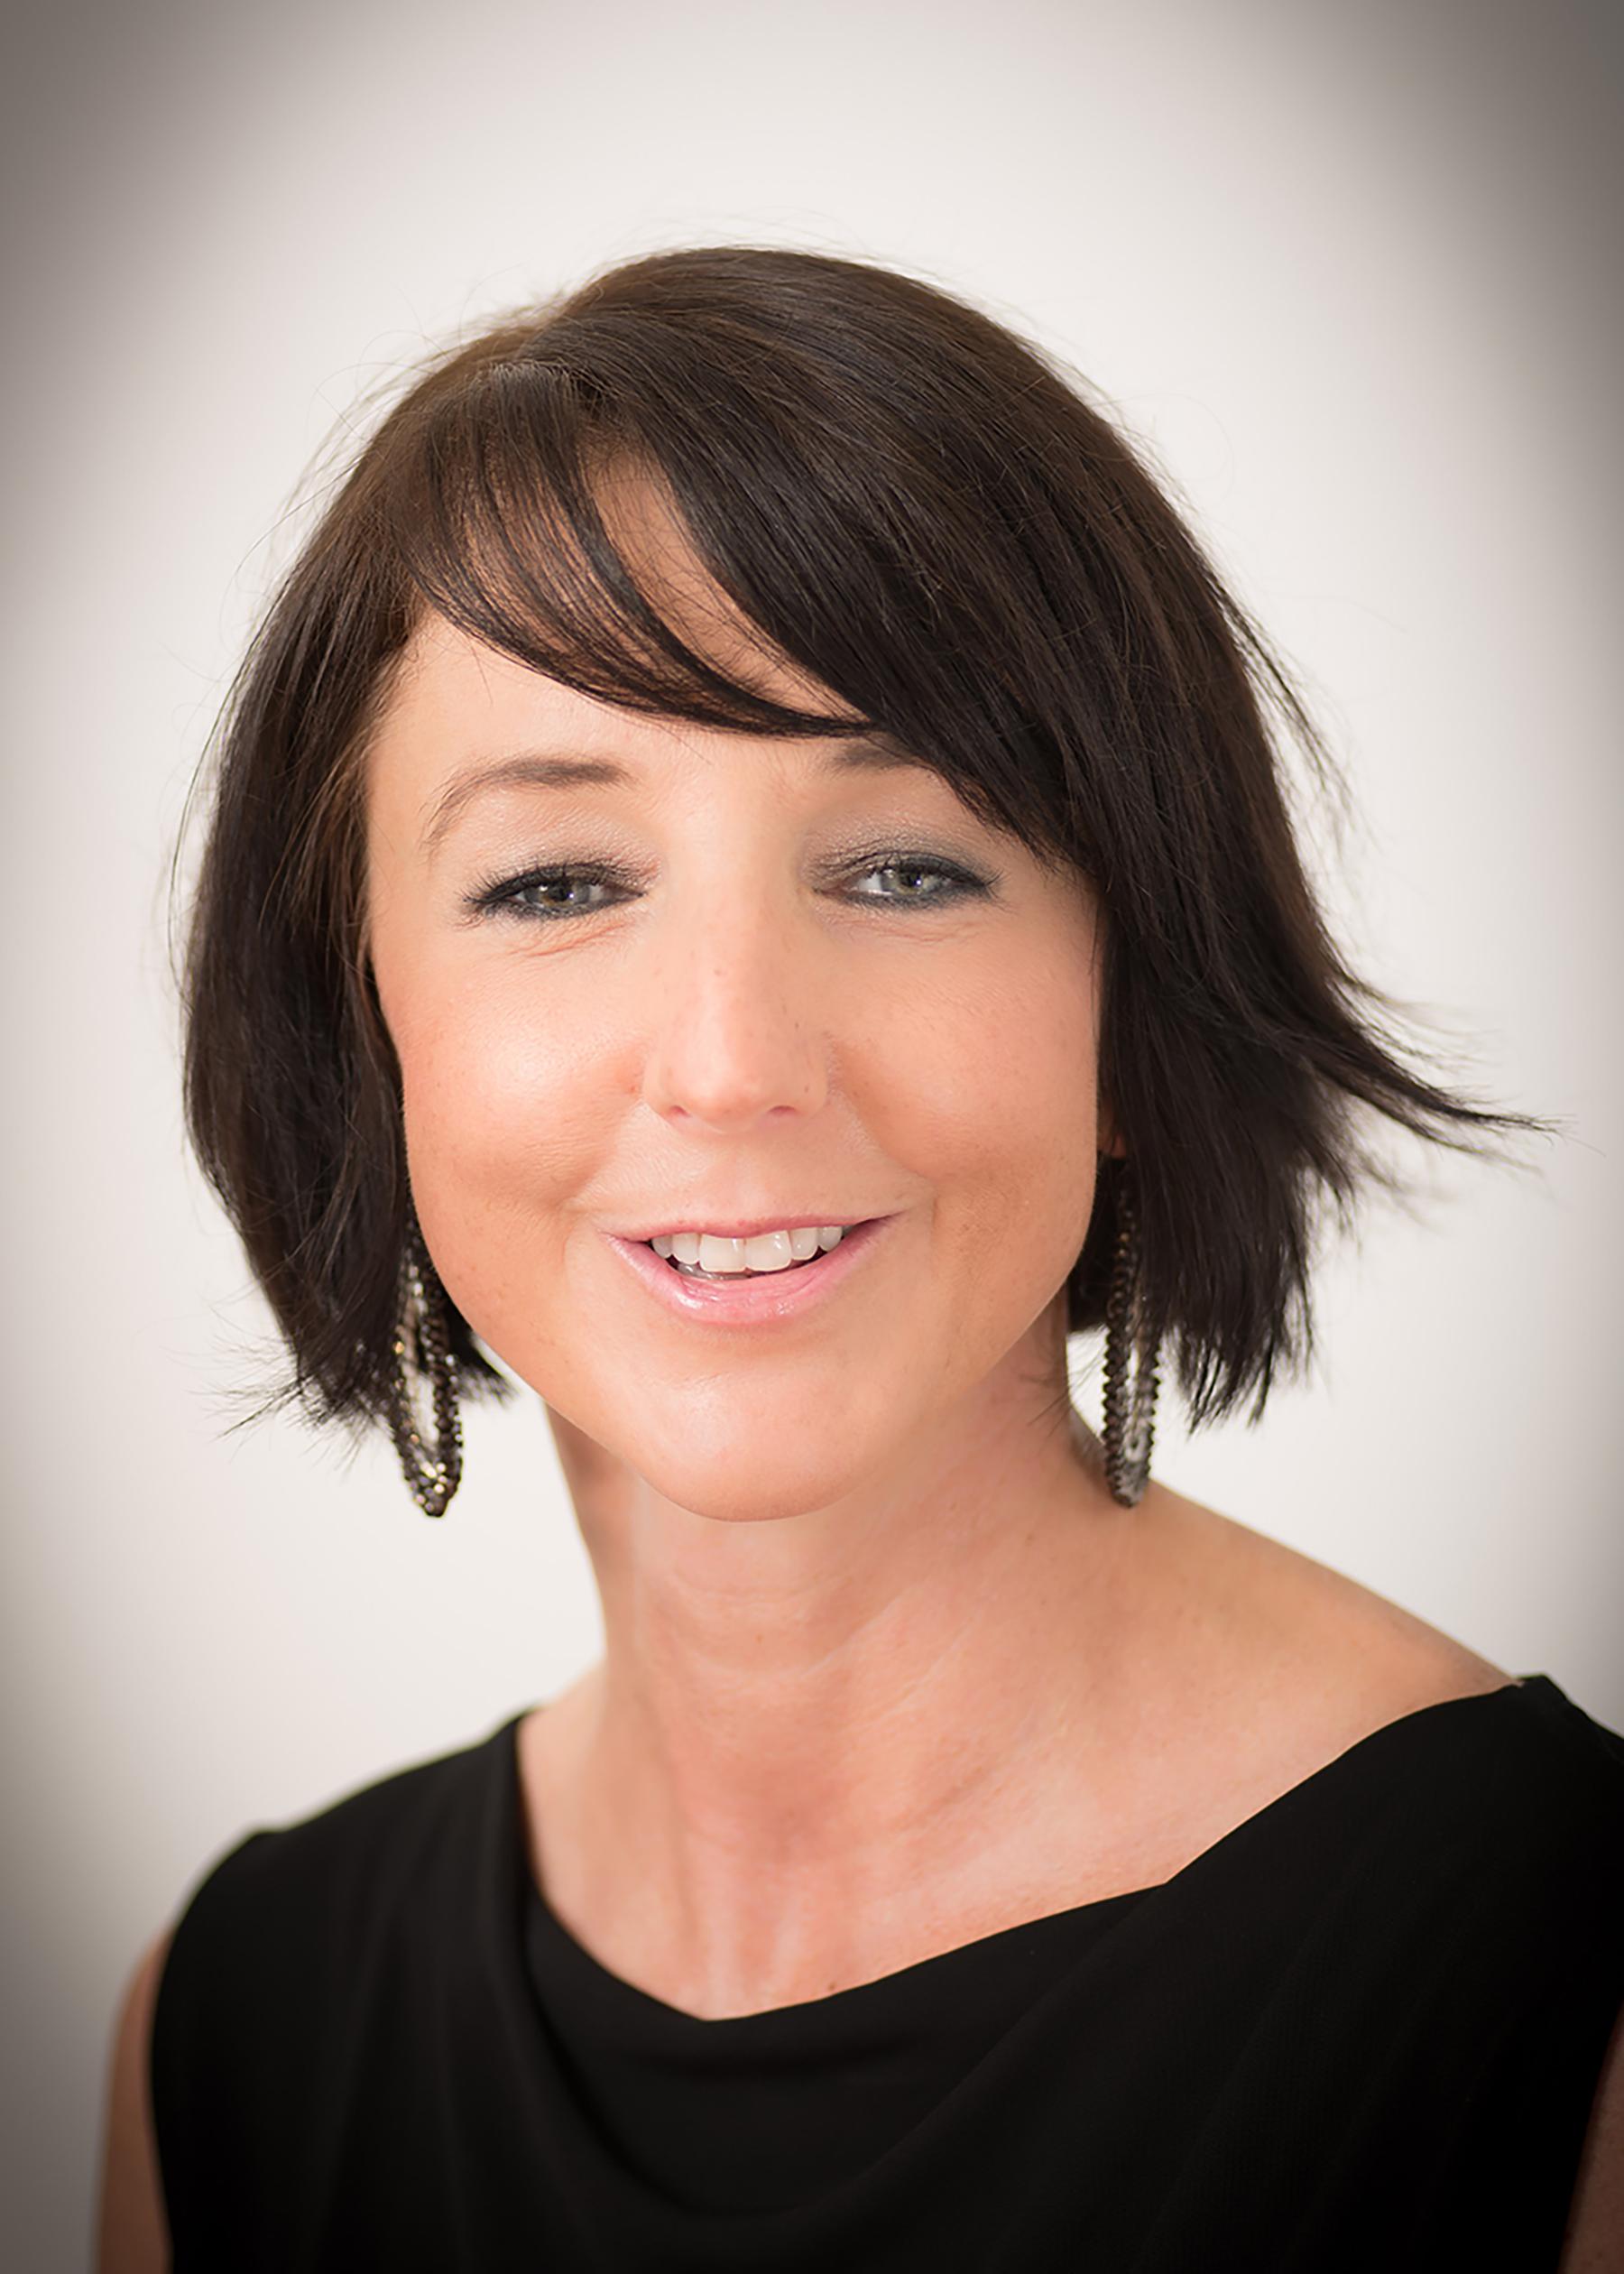 Bristol, UK Female Business Executive Portraits